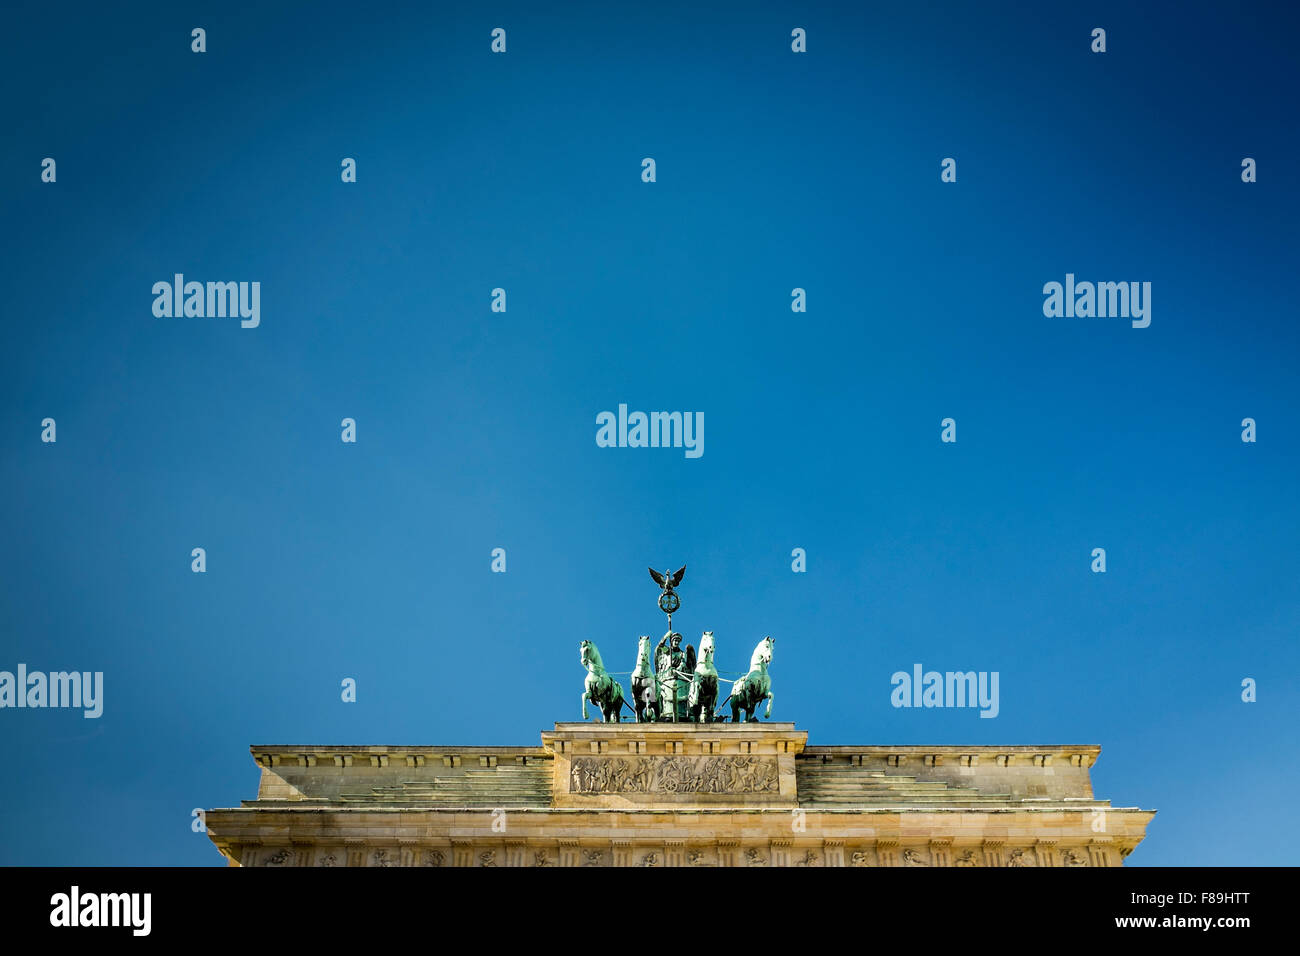 Quadriga auf dem Brandenburger Tor, Berlin, Deutschland Stockbild